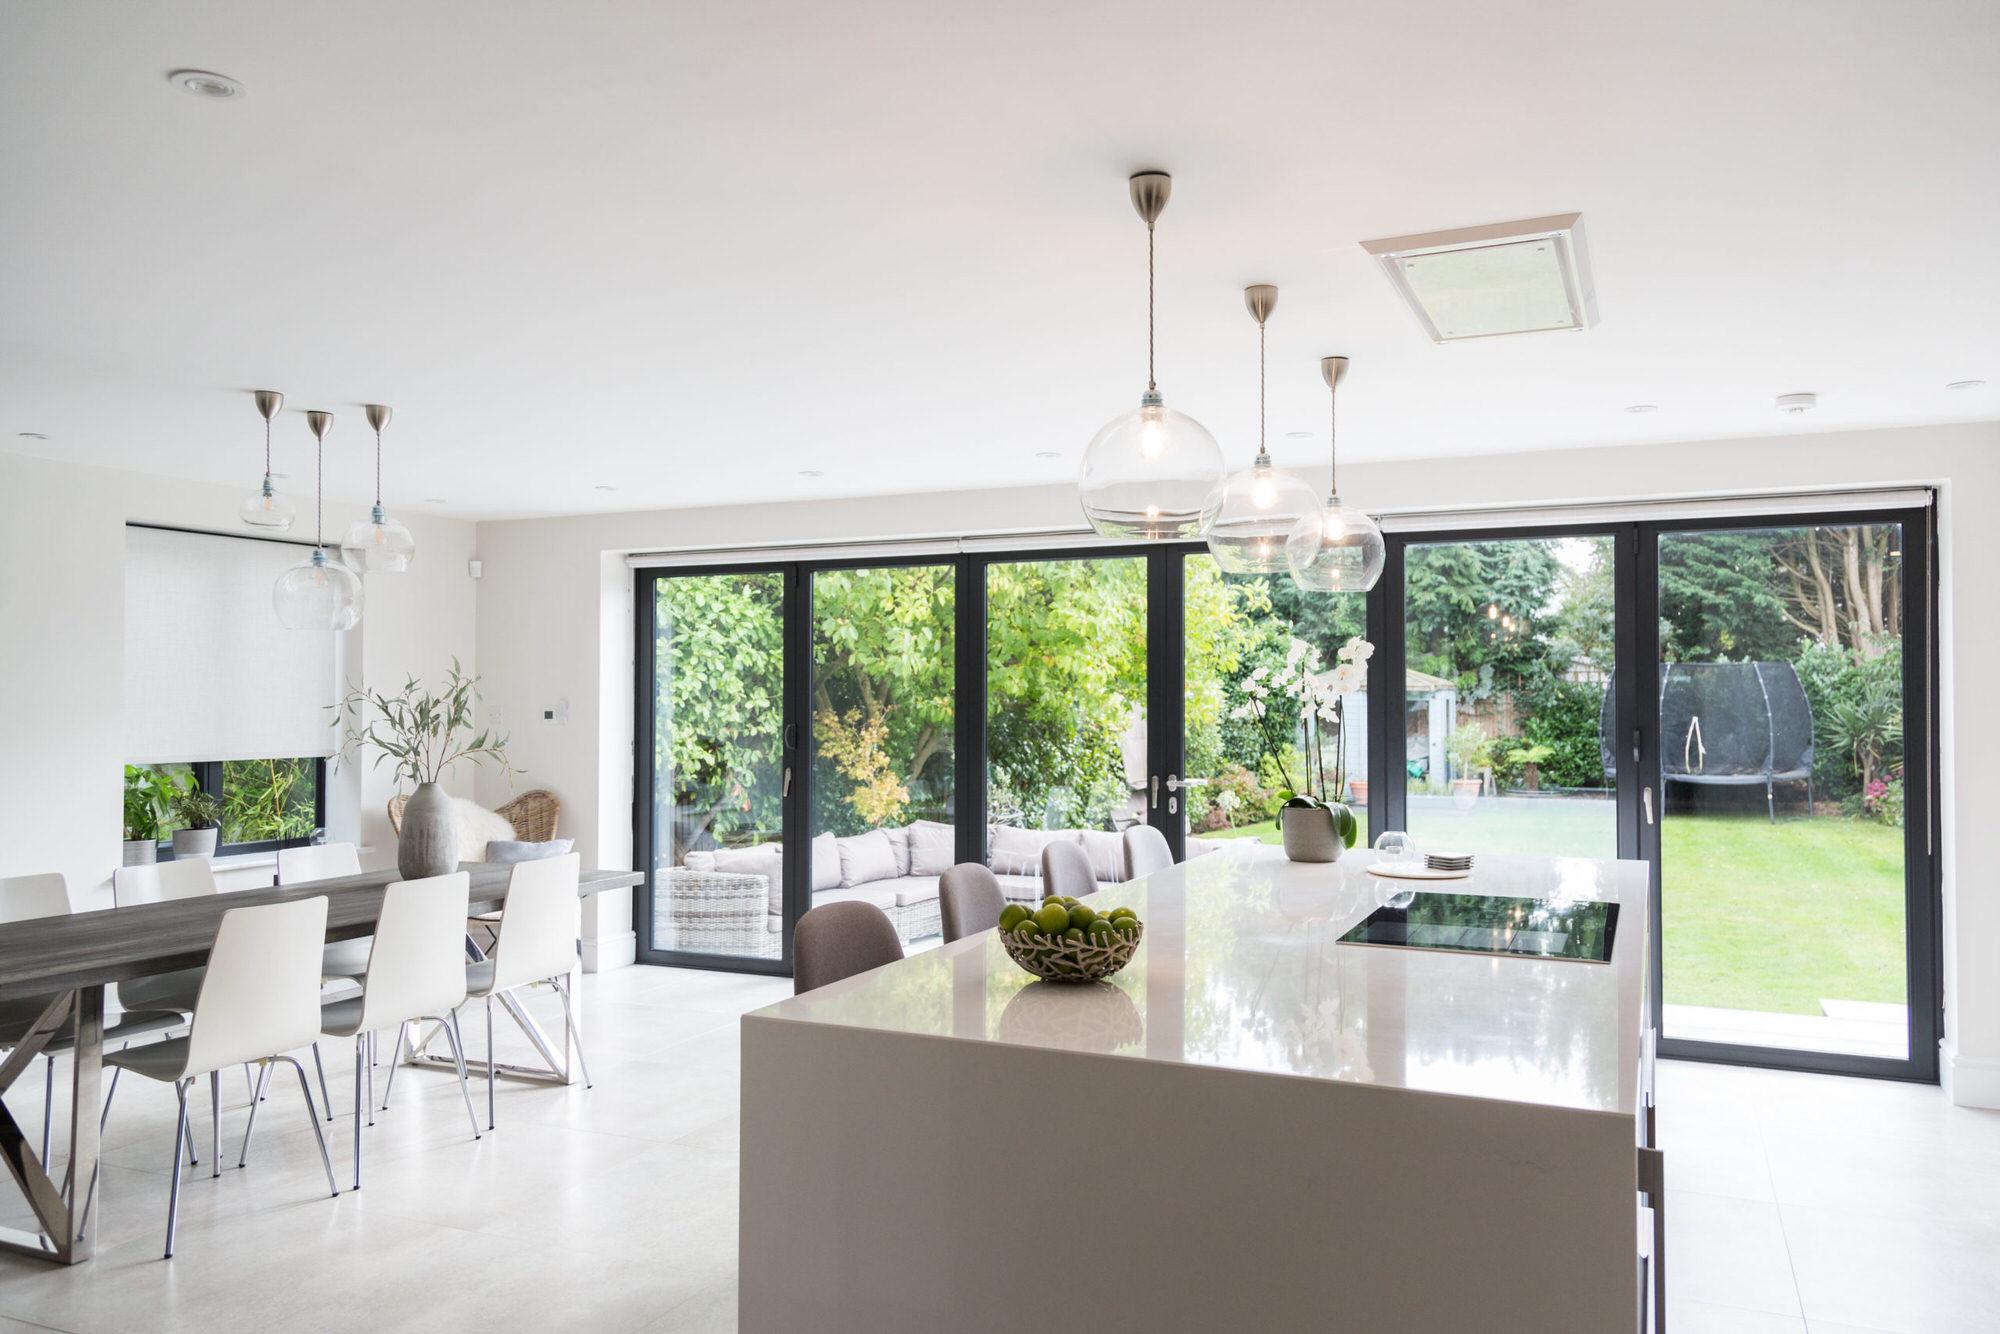 large open plan kitchen featuring island taken at interiors photoshoot for IG interior design London Kent